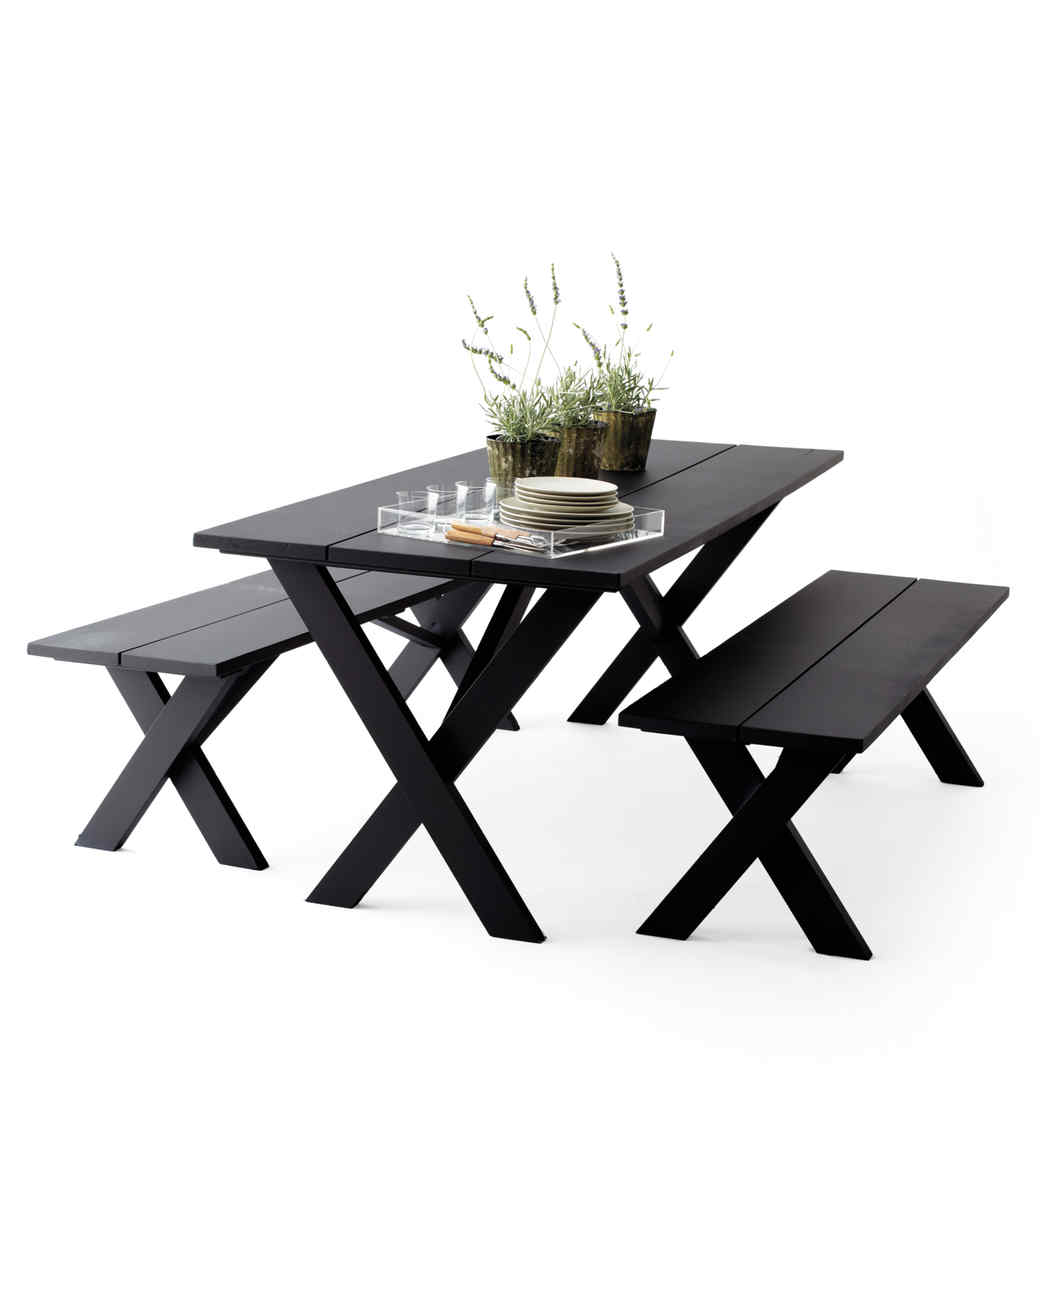 black-table-016-md108770.jpg